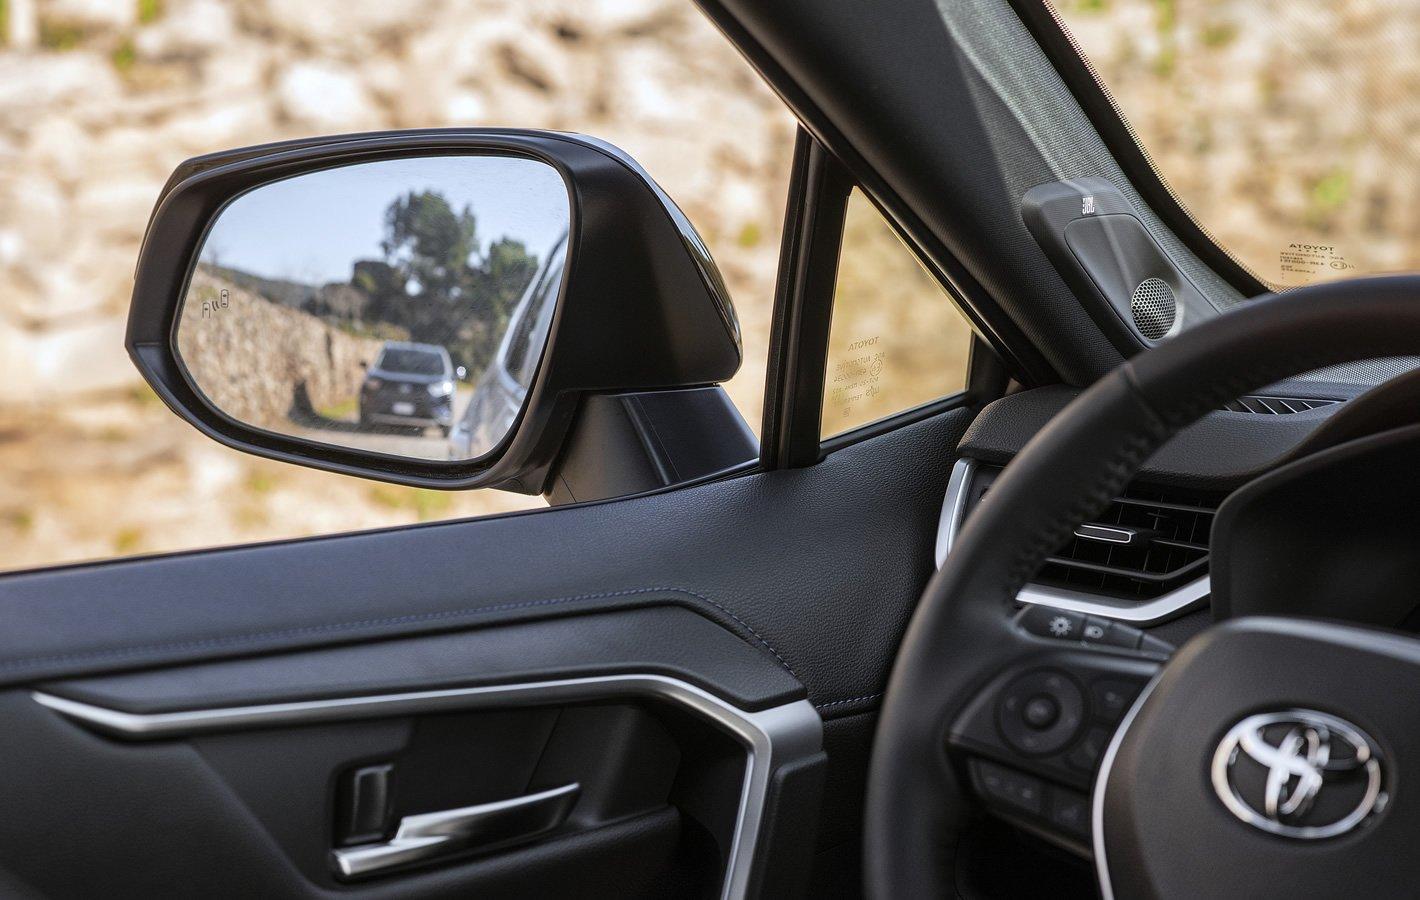 Toyota RAV4 Hybrid 2019 - systemy bezpieczeństwa